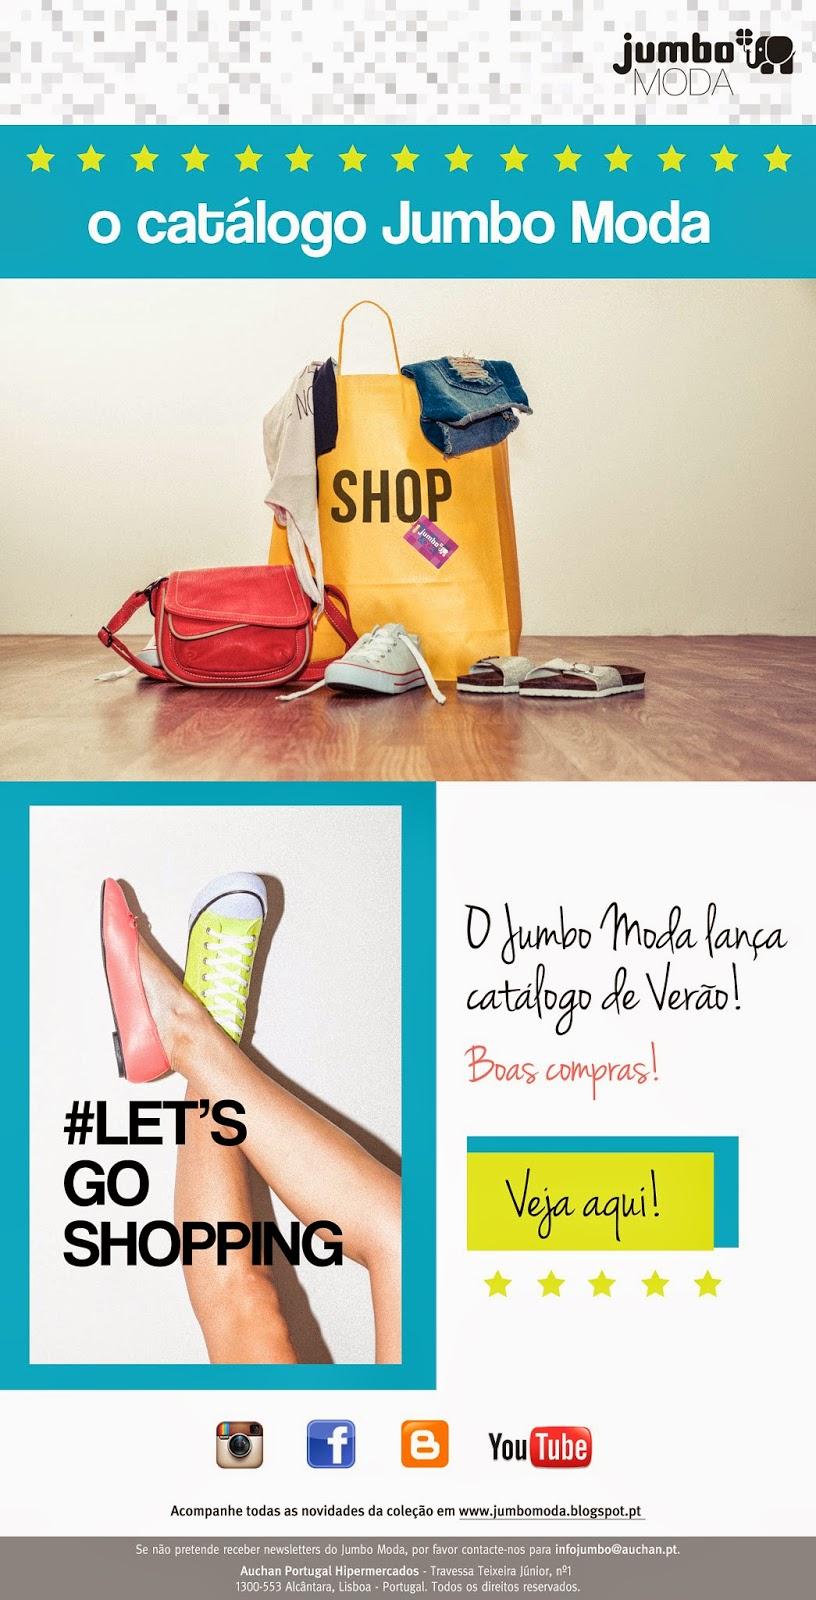 http://folhetos.jumbo.pt/PublicidadeJumbo/JumboModa/CatalogoJumboModaPV2014/?utm_source=e-goi&utm_medium=email&utm_term=Veja+o+ultimo+catalogo+de+Verao%21&utm_campaign=Jumbo